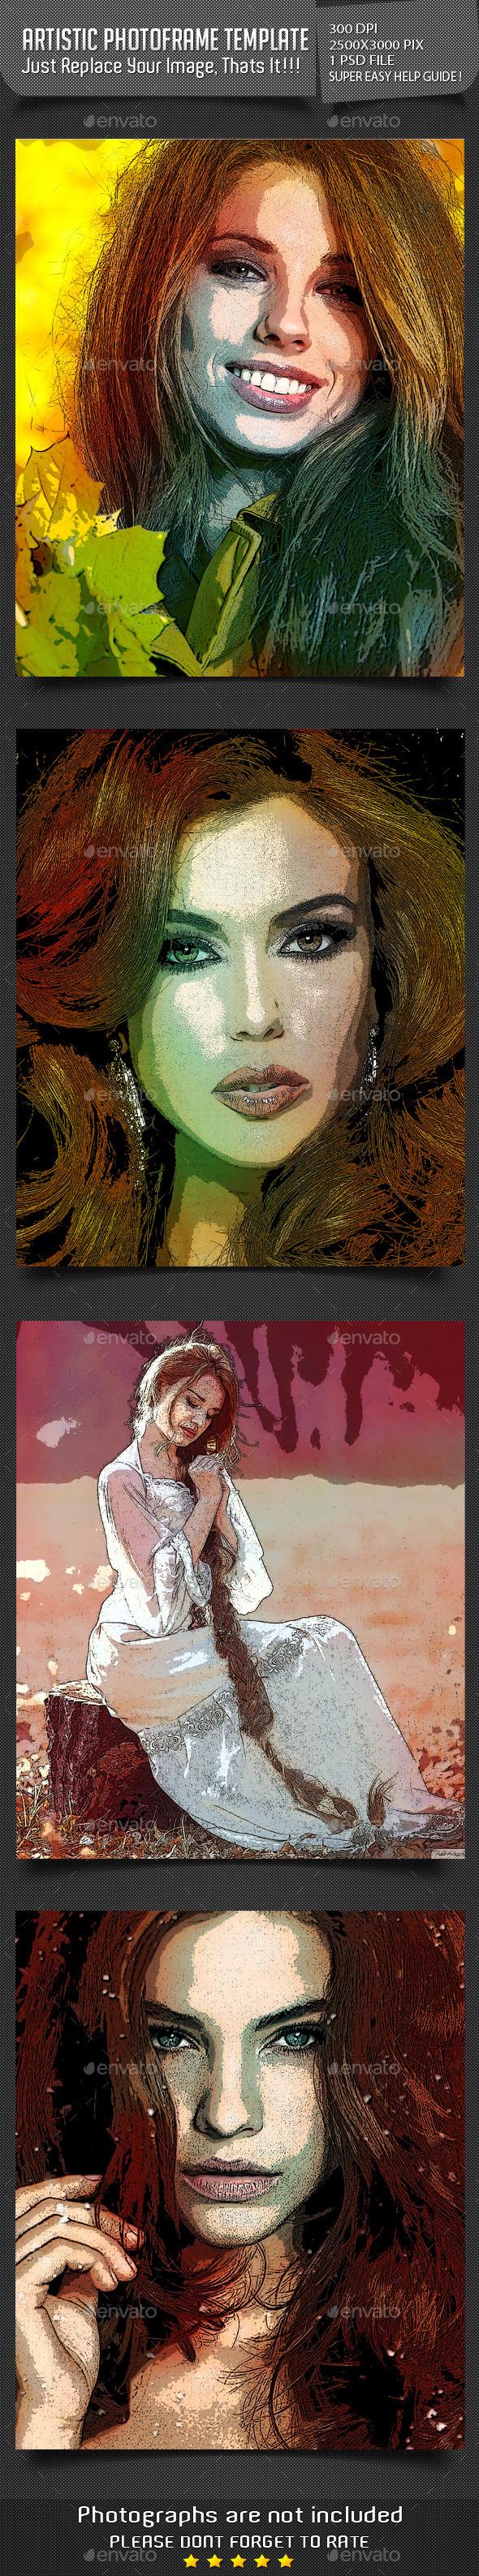 Artistic Photoframe Templates - Artistic Photo Templates